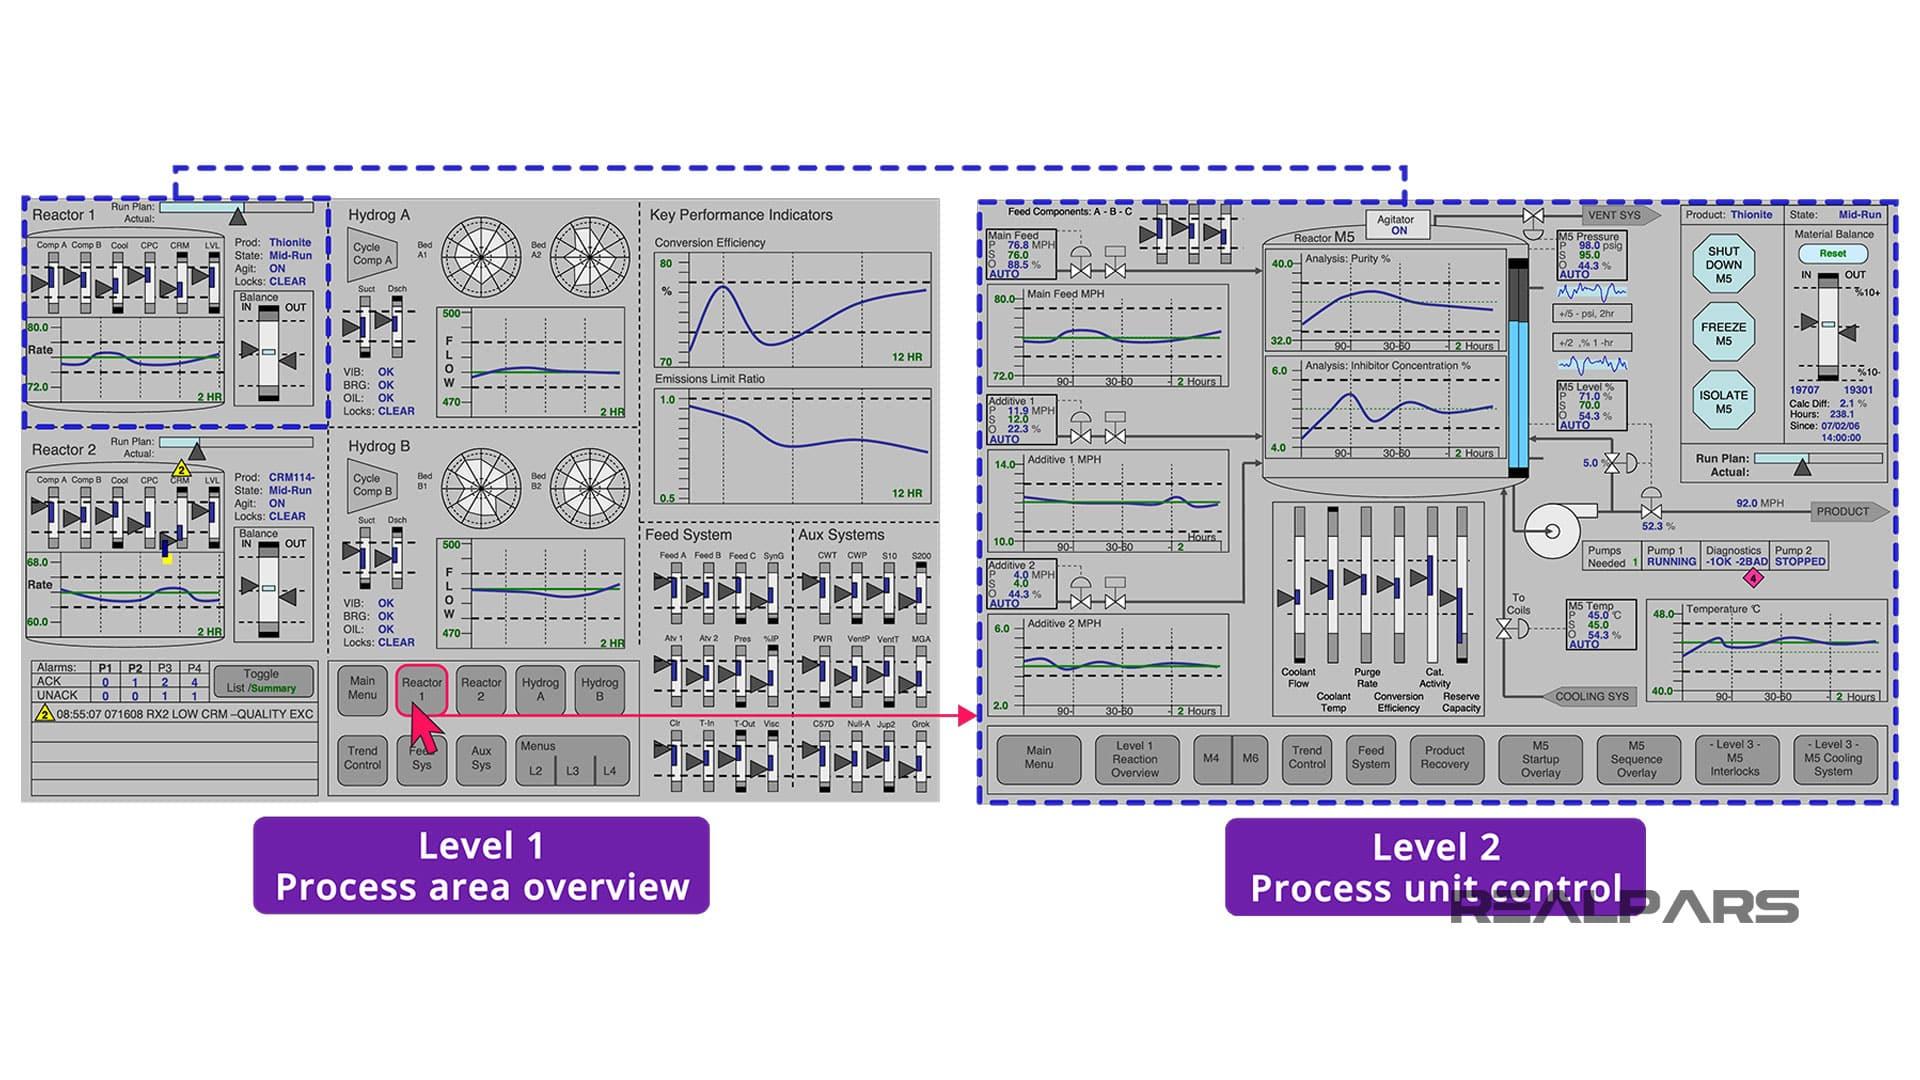 HMI display - Level 2